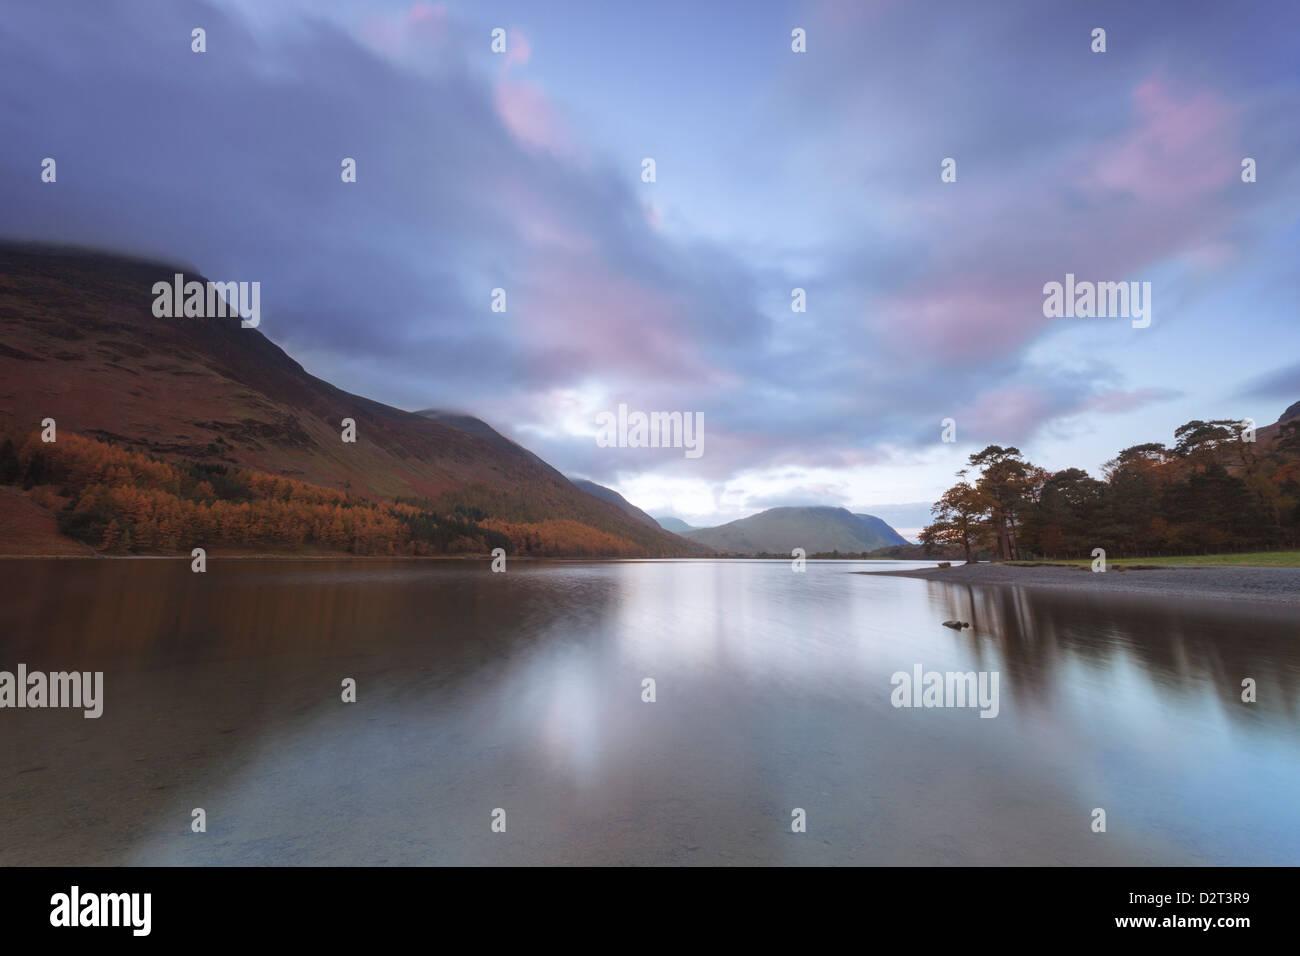 Buttermere at dusk, Lake District National Park, Cumbria, England, United Kingdom, Europe - Stock Image